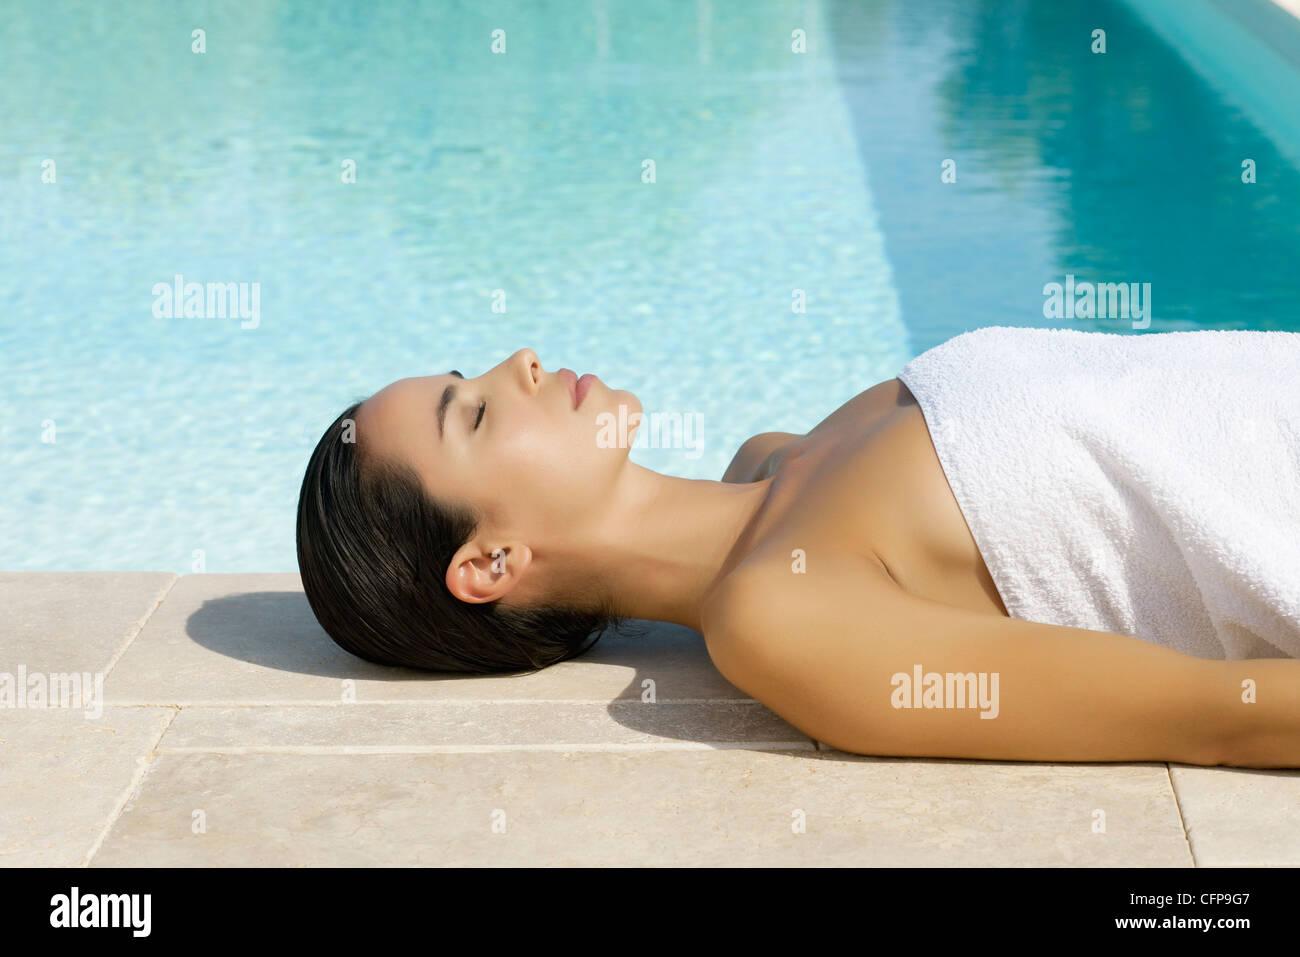 Woman sunbathing by pool - Stock Image